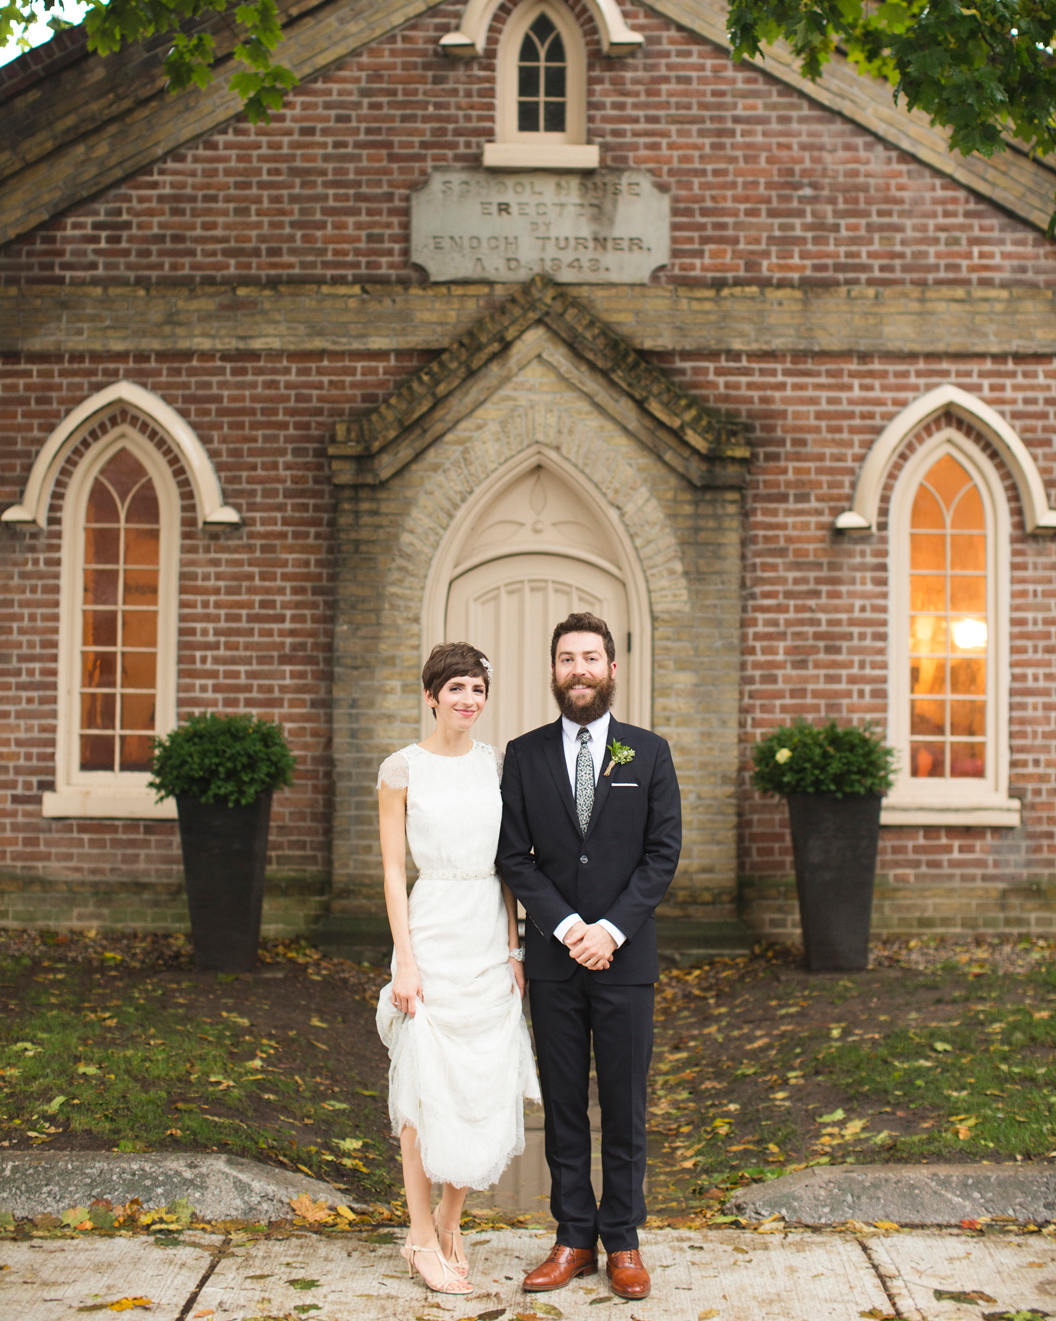 trish-alan-wedding-portrait4-062-s111348-0714.jpg